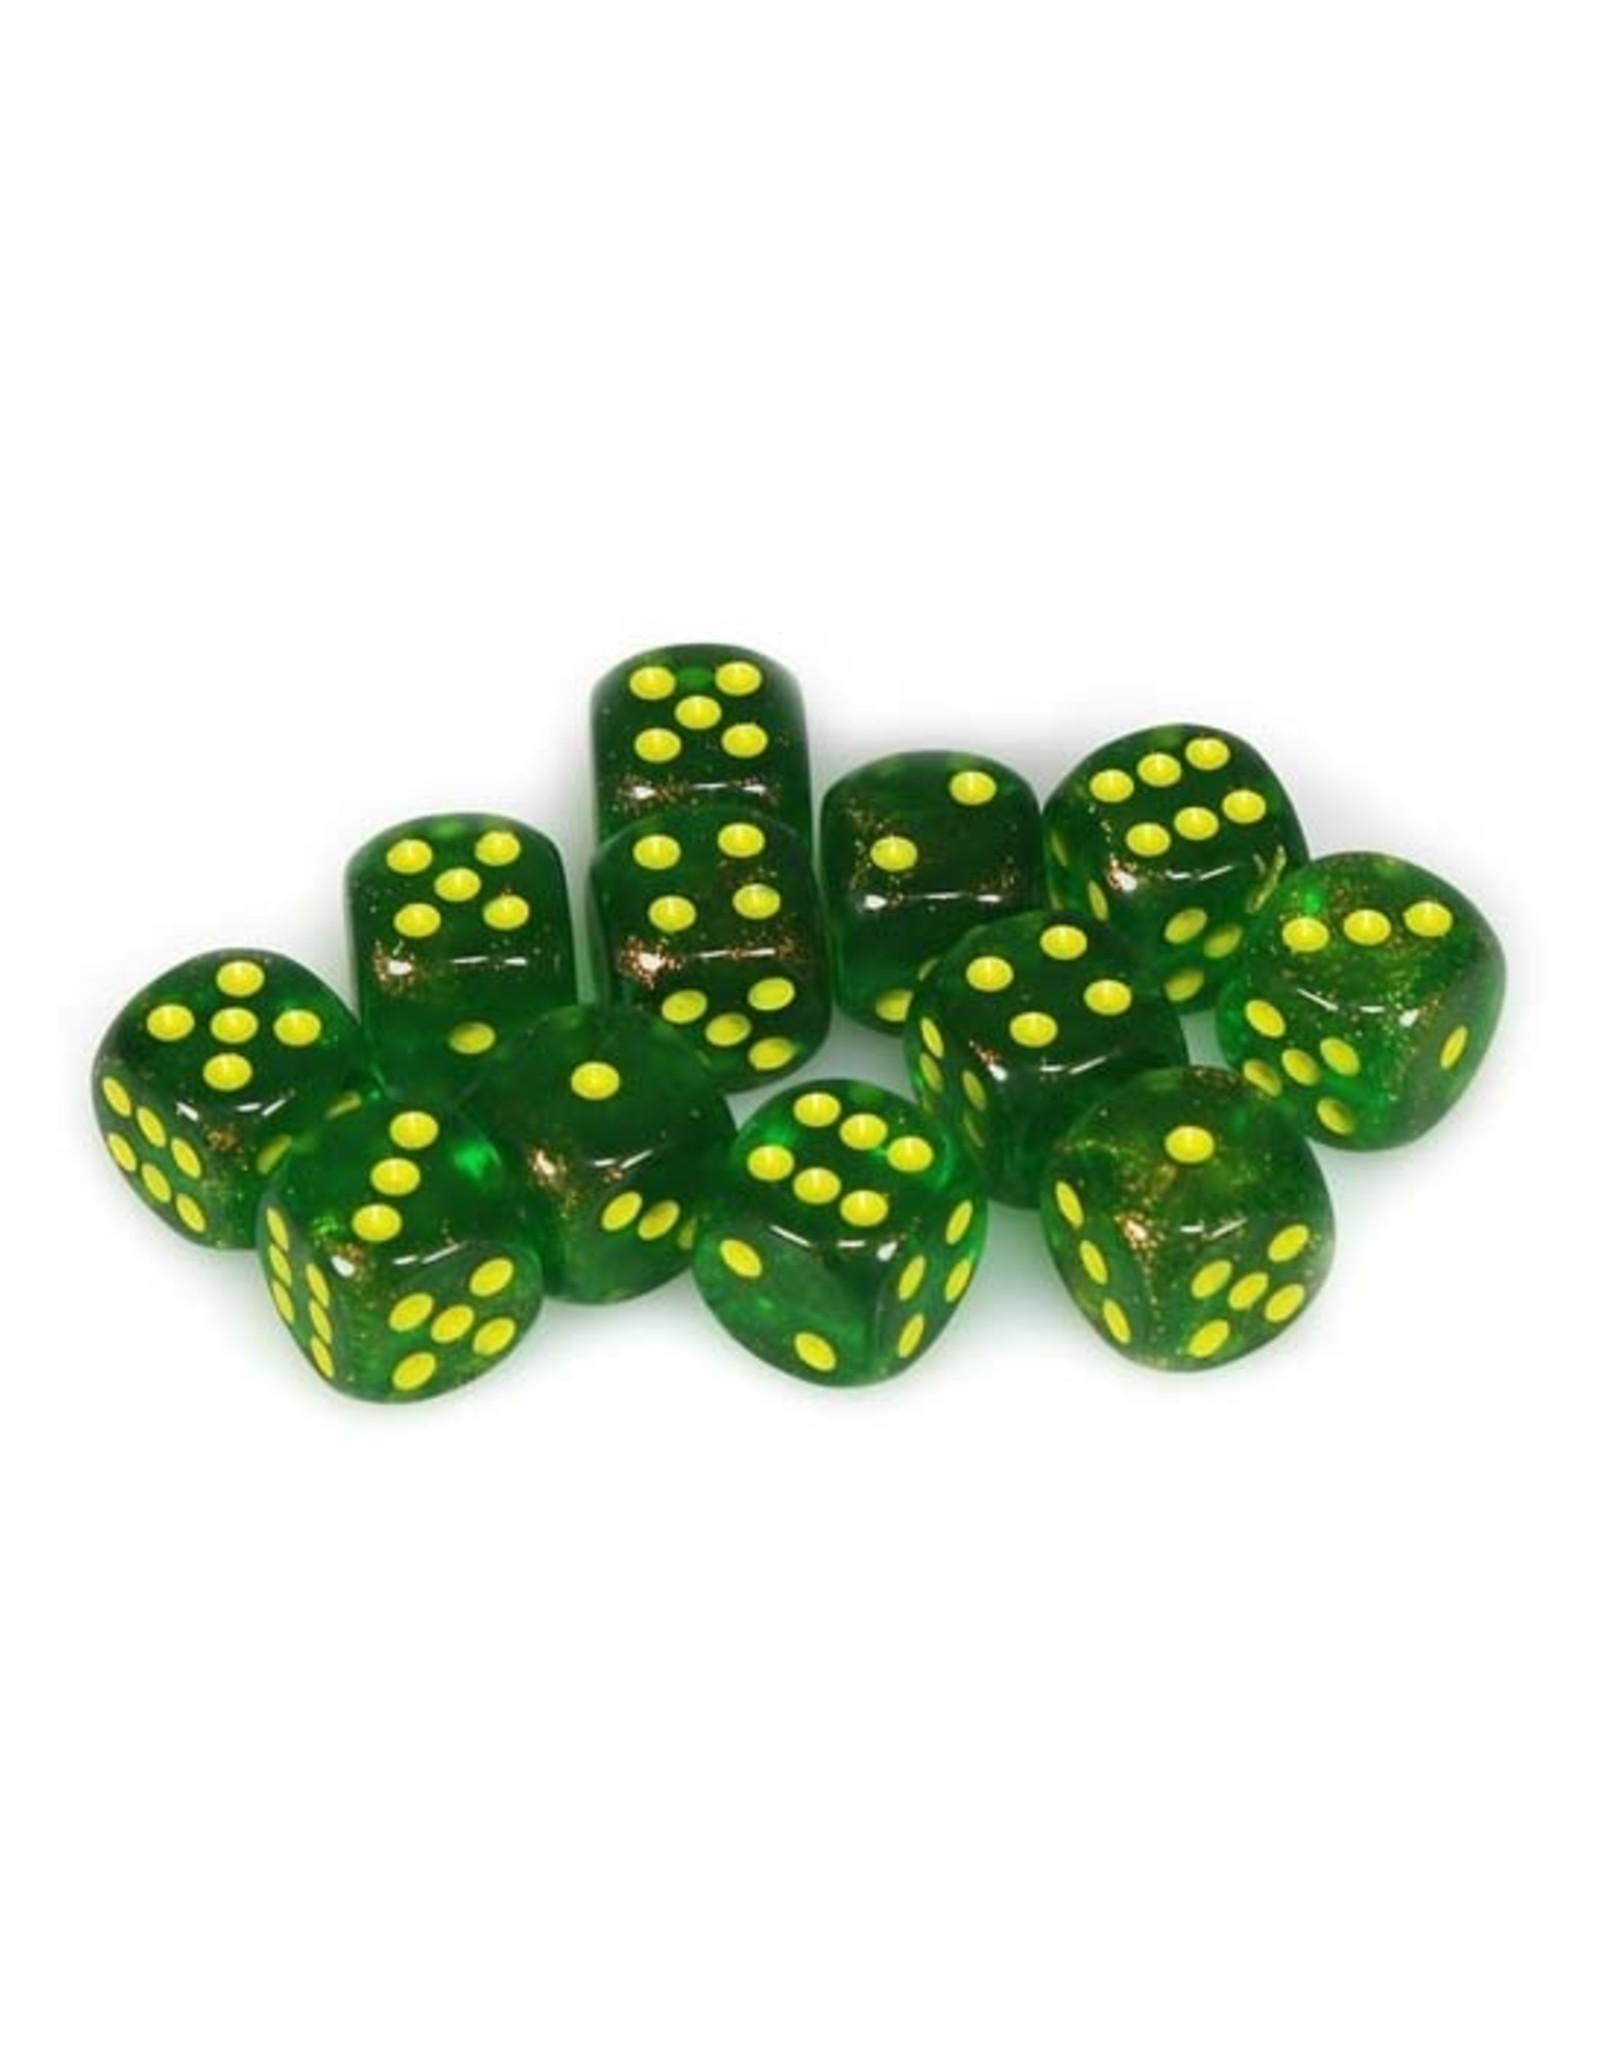 Chessex Chessex: 16mm D6 - Borealis - Maple Green w/ Yellow